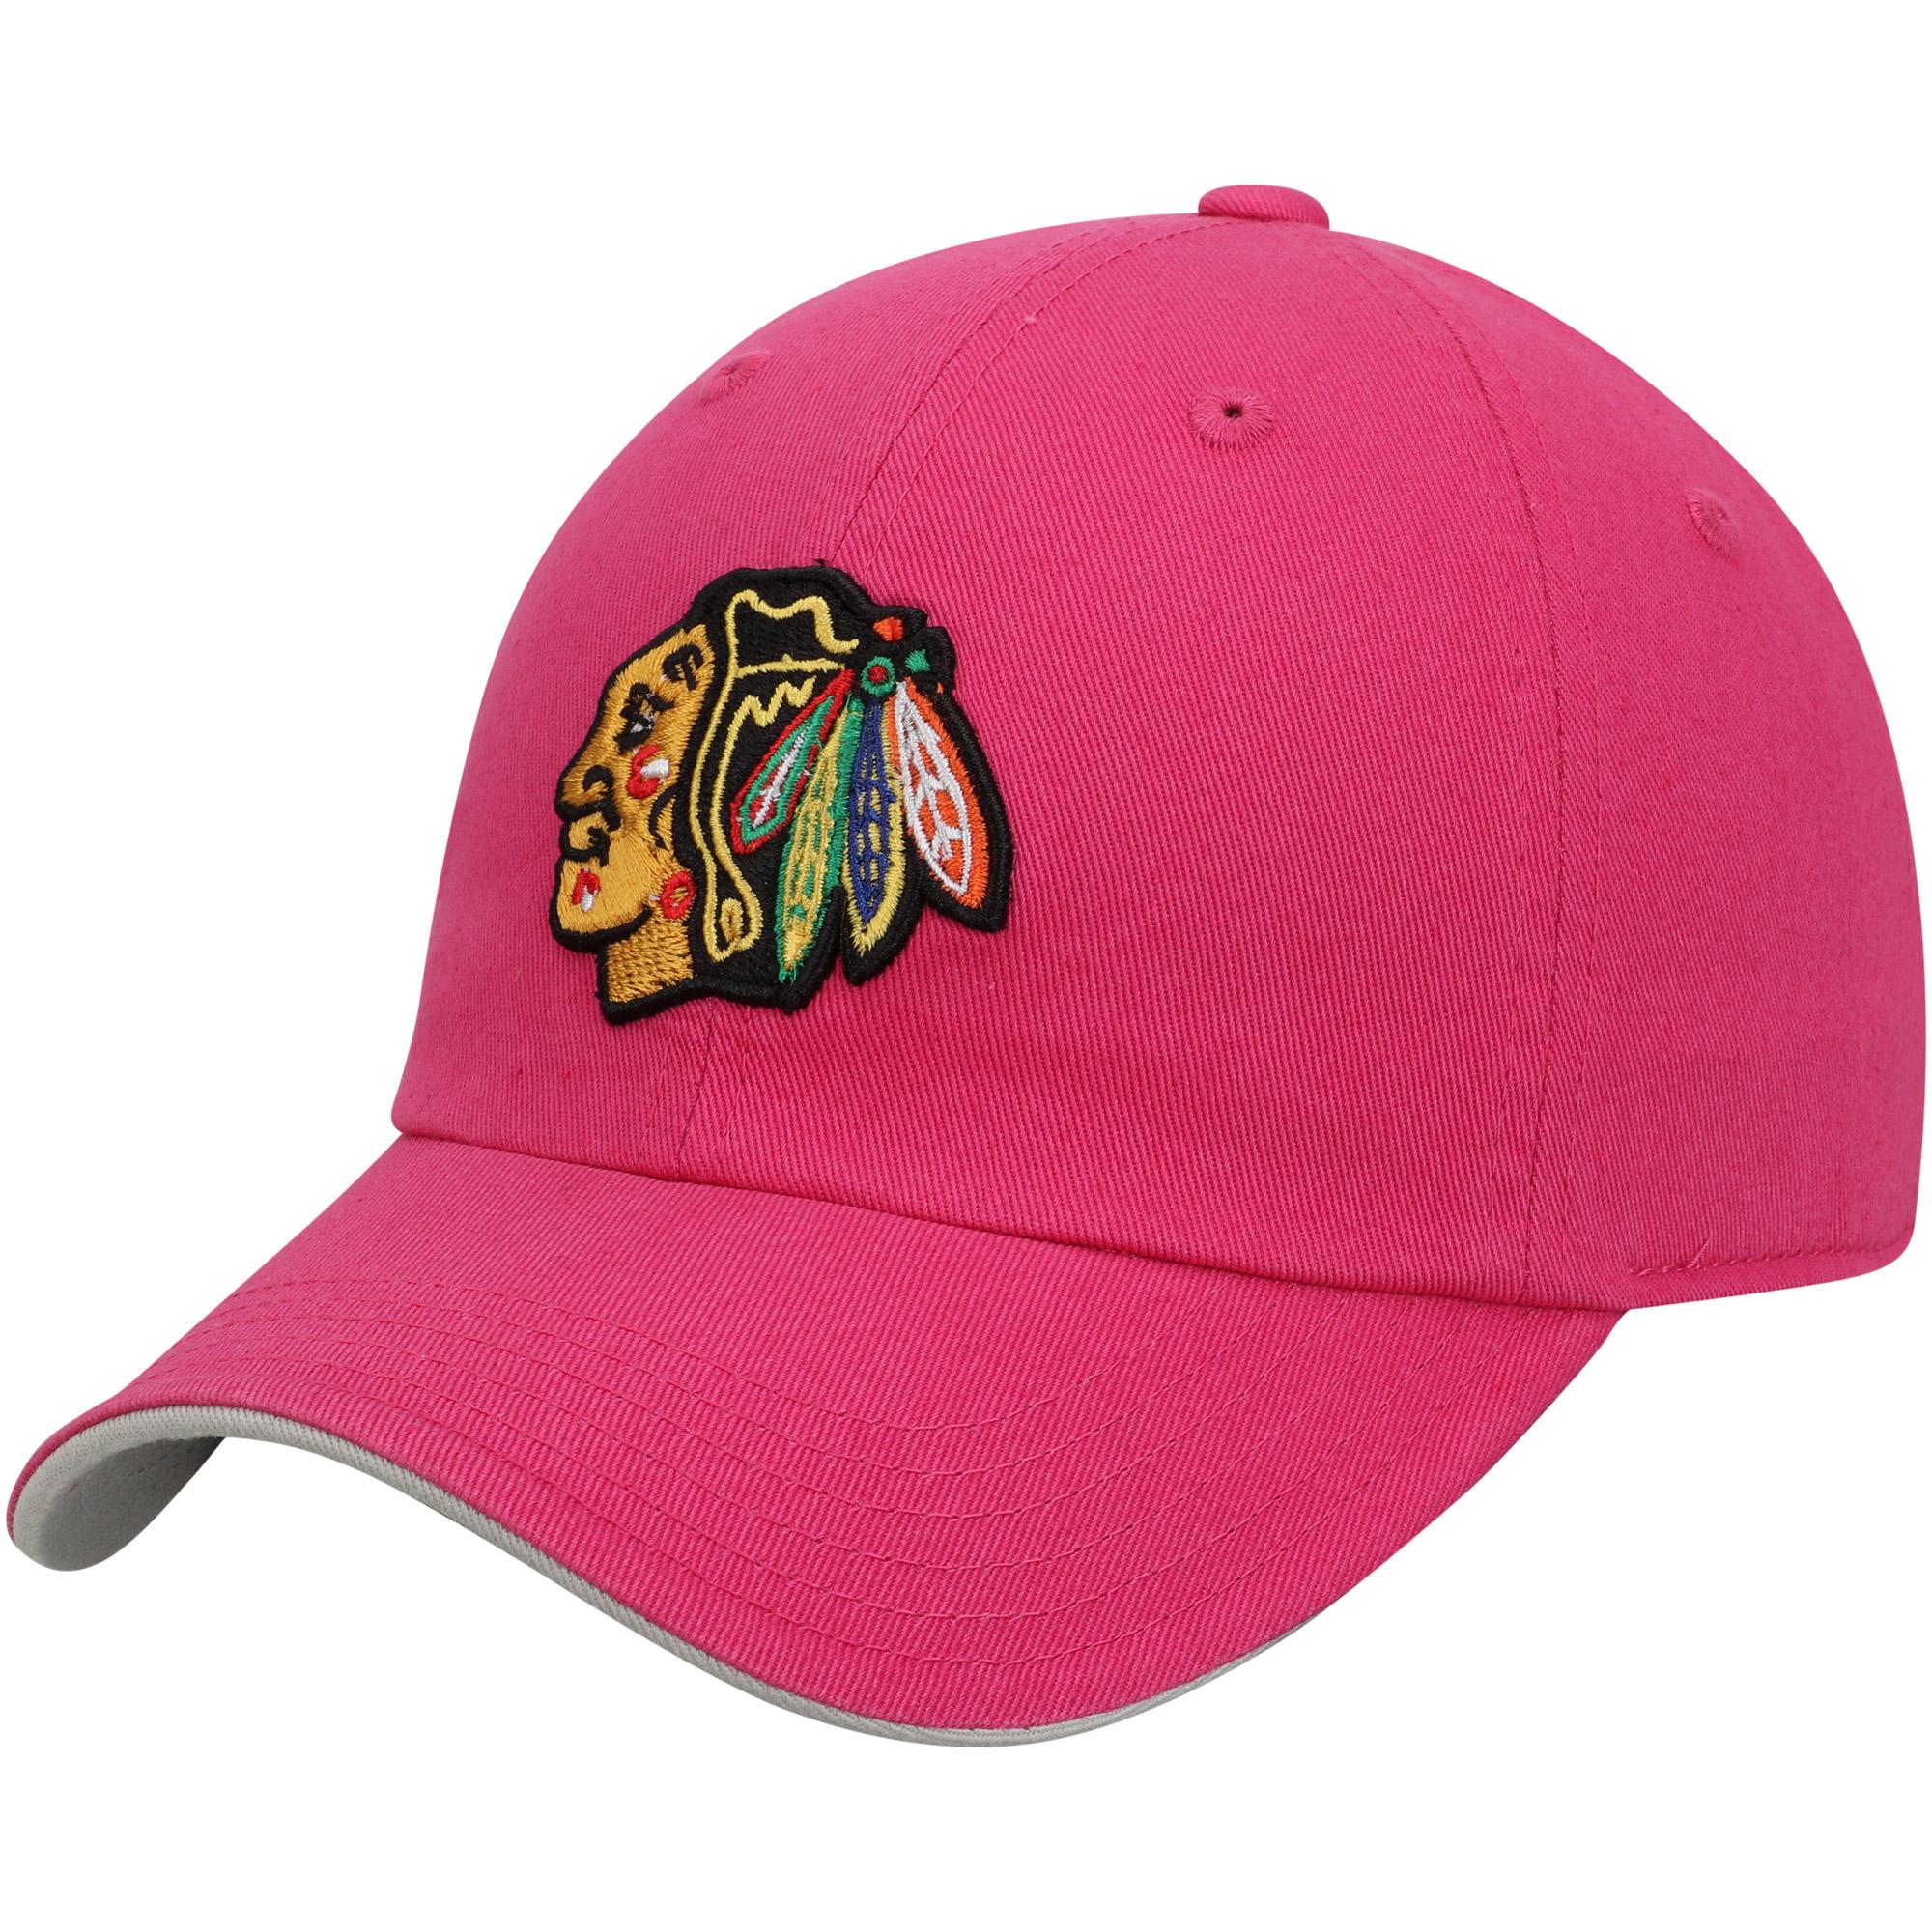 Chicago Blackhawks Girls Youth Slouch Adjustable Hat - Pink - OSFA